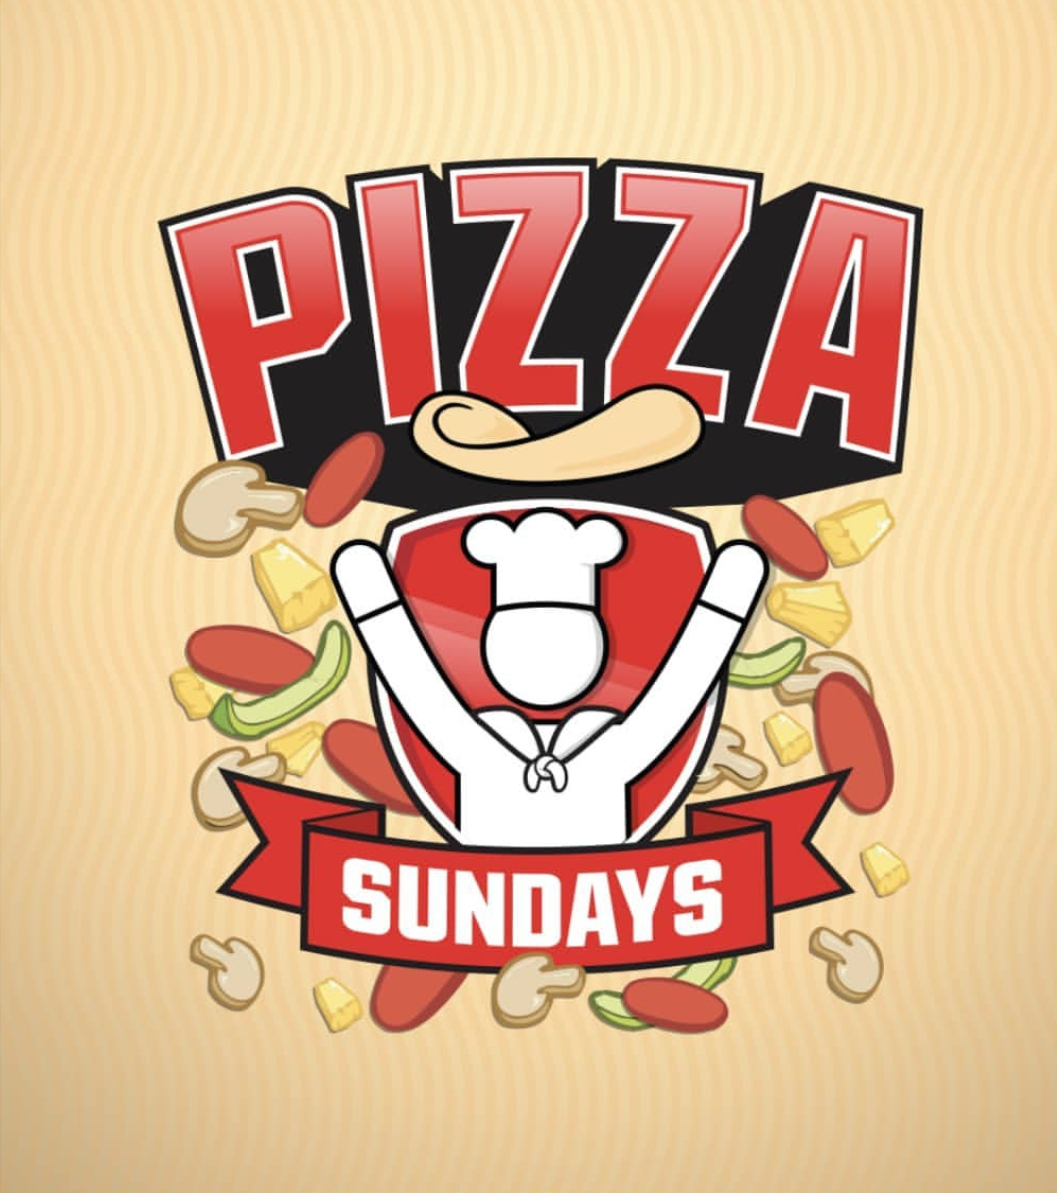 PIZZA SUNDAYS